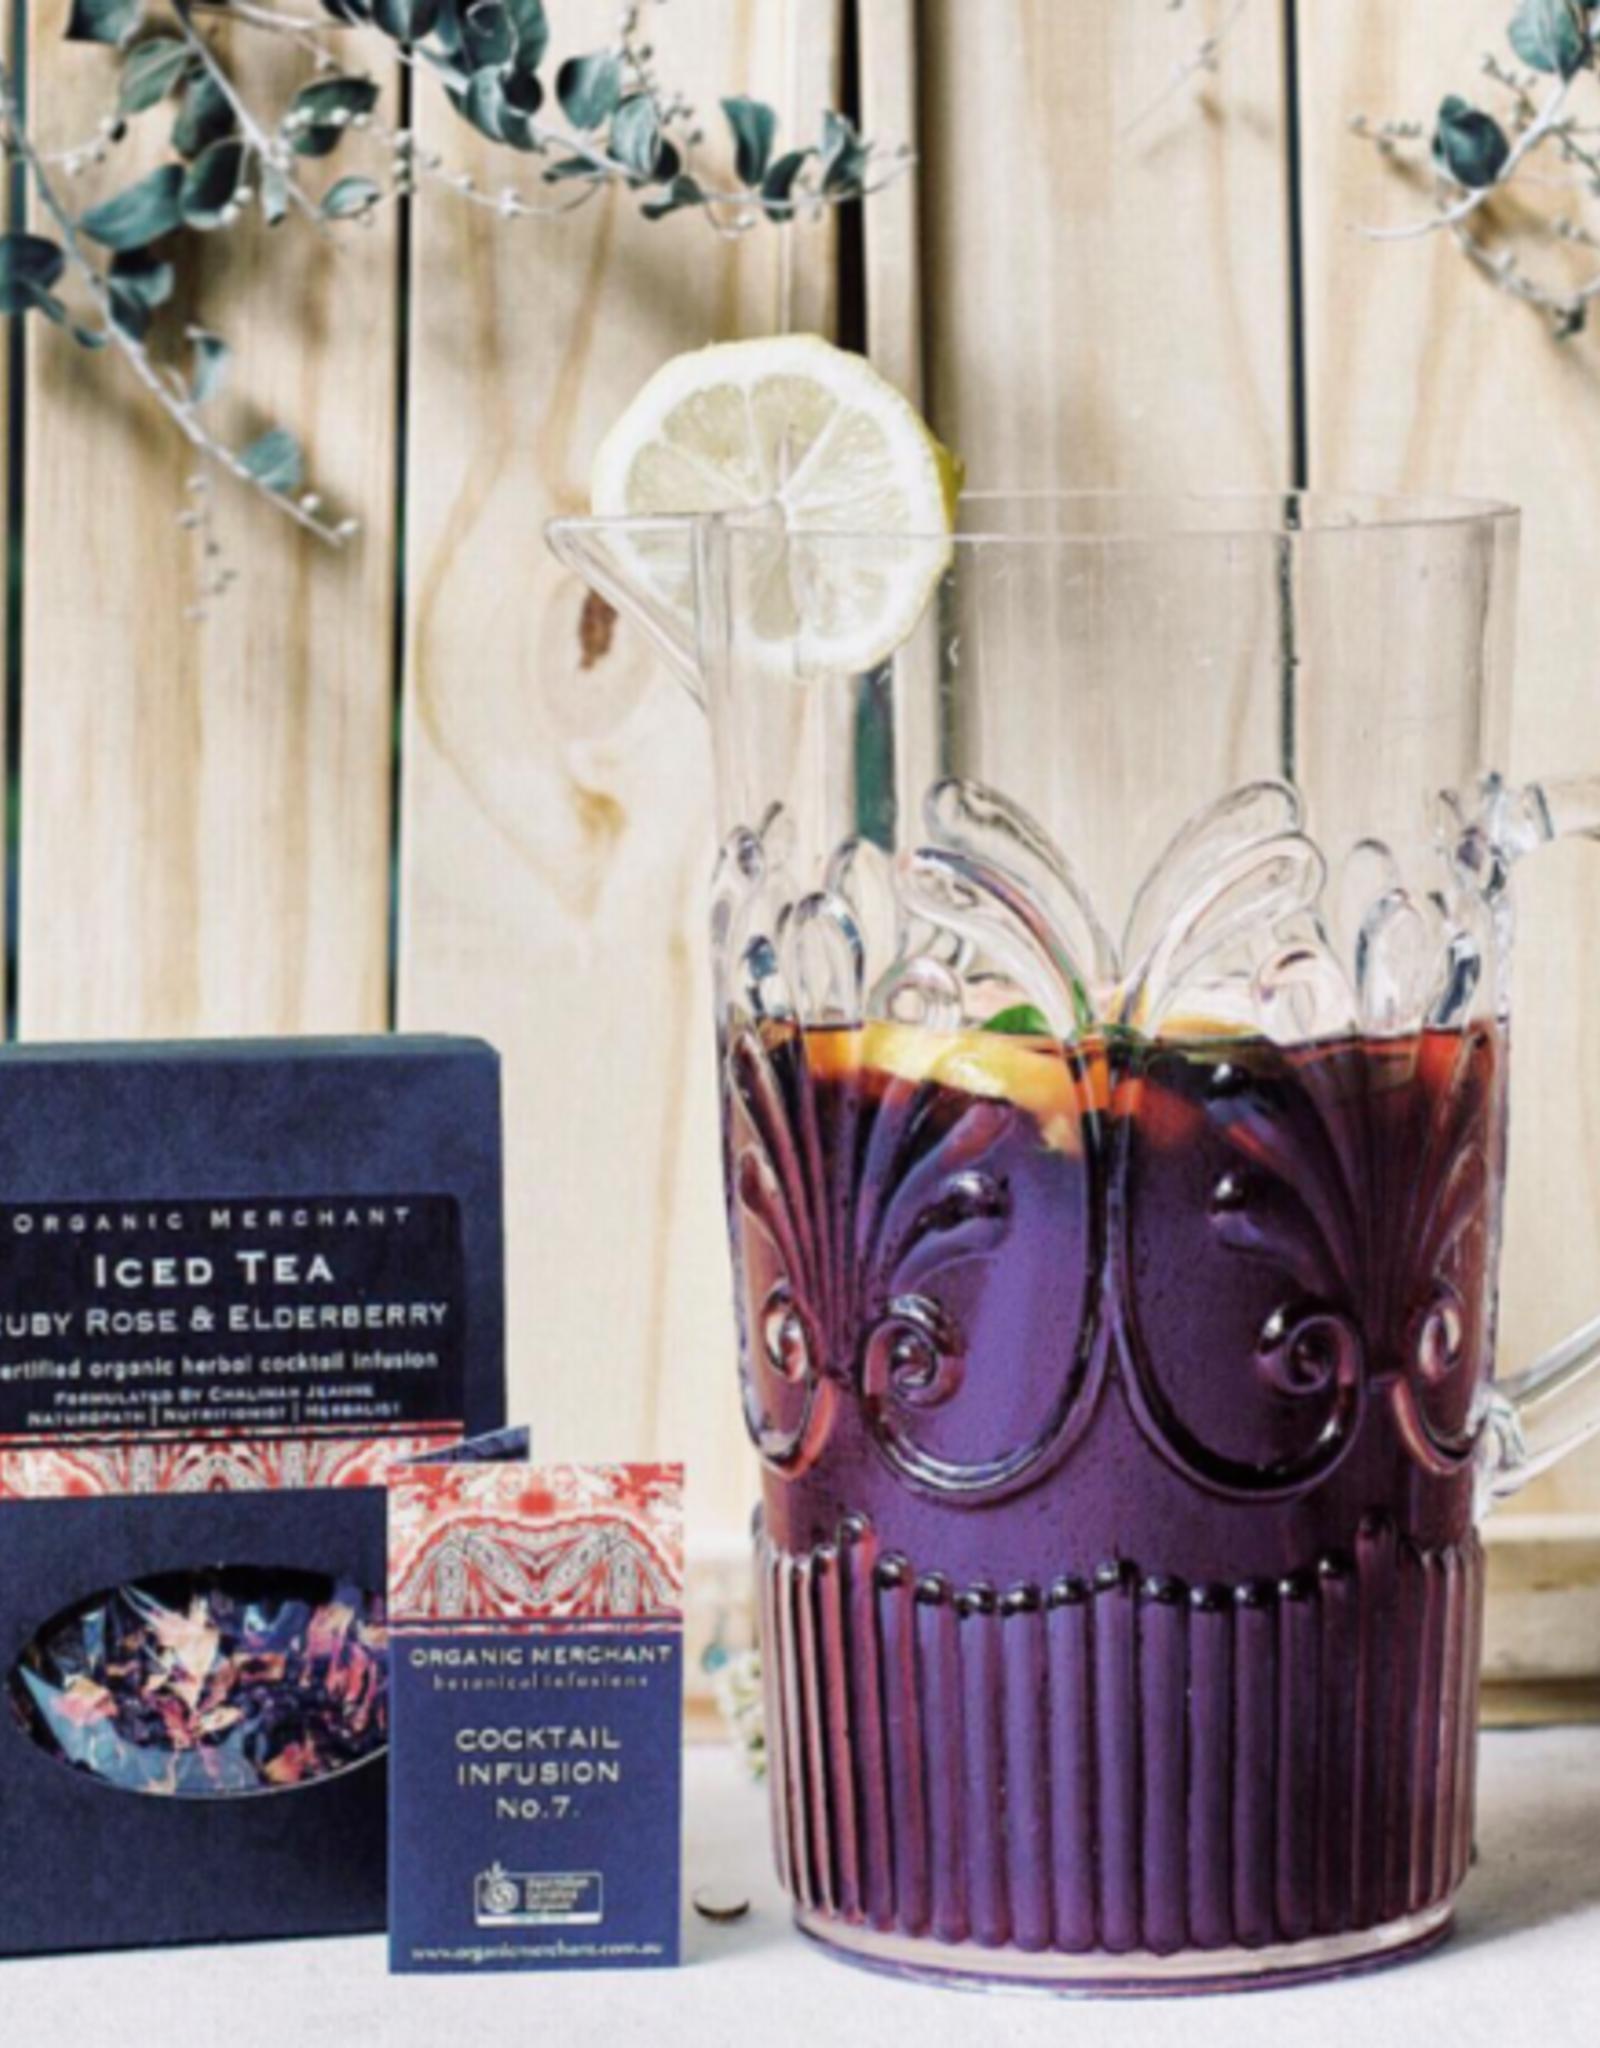 Iced Tea Gift Box